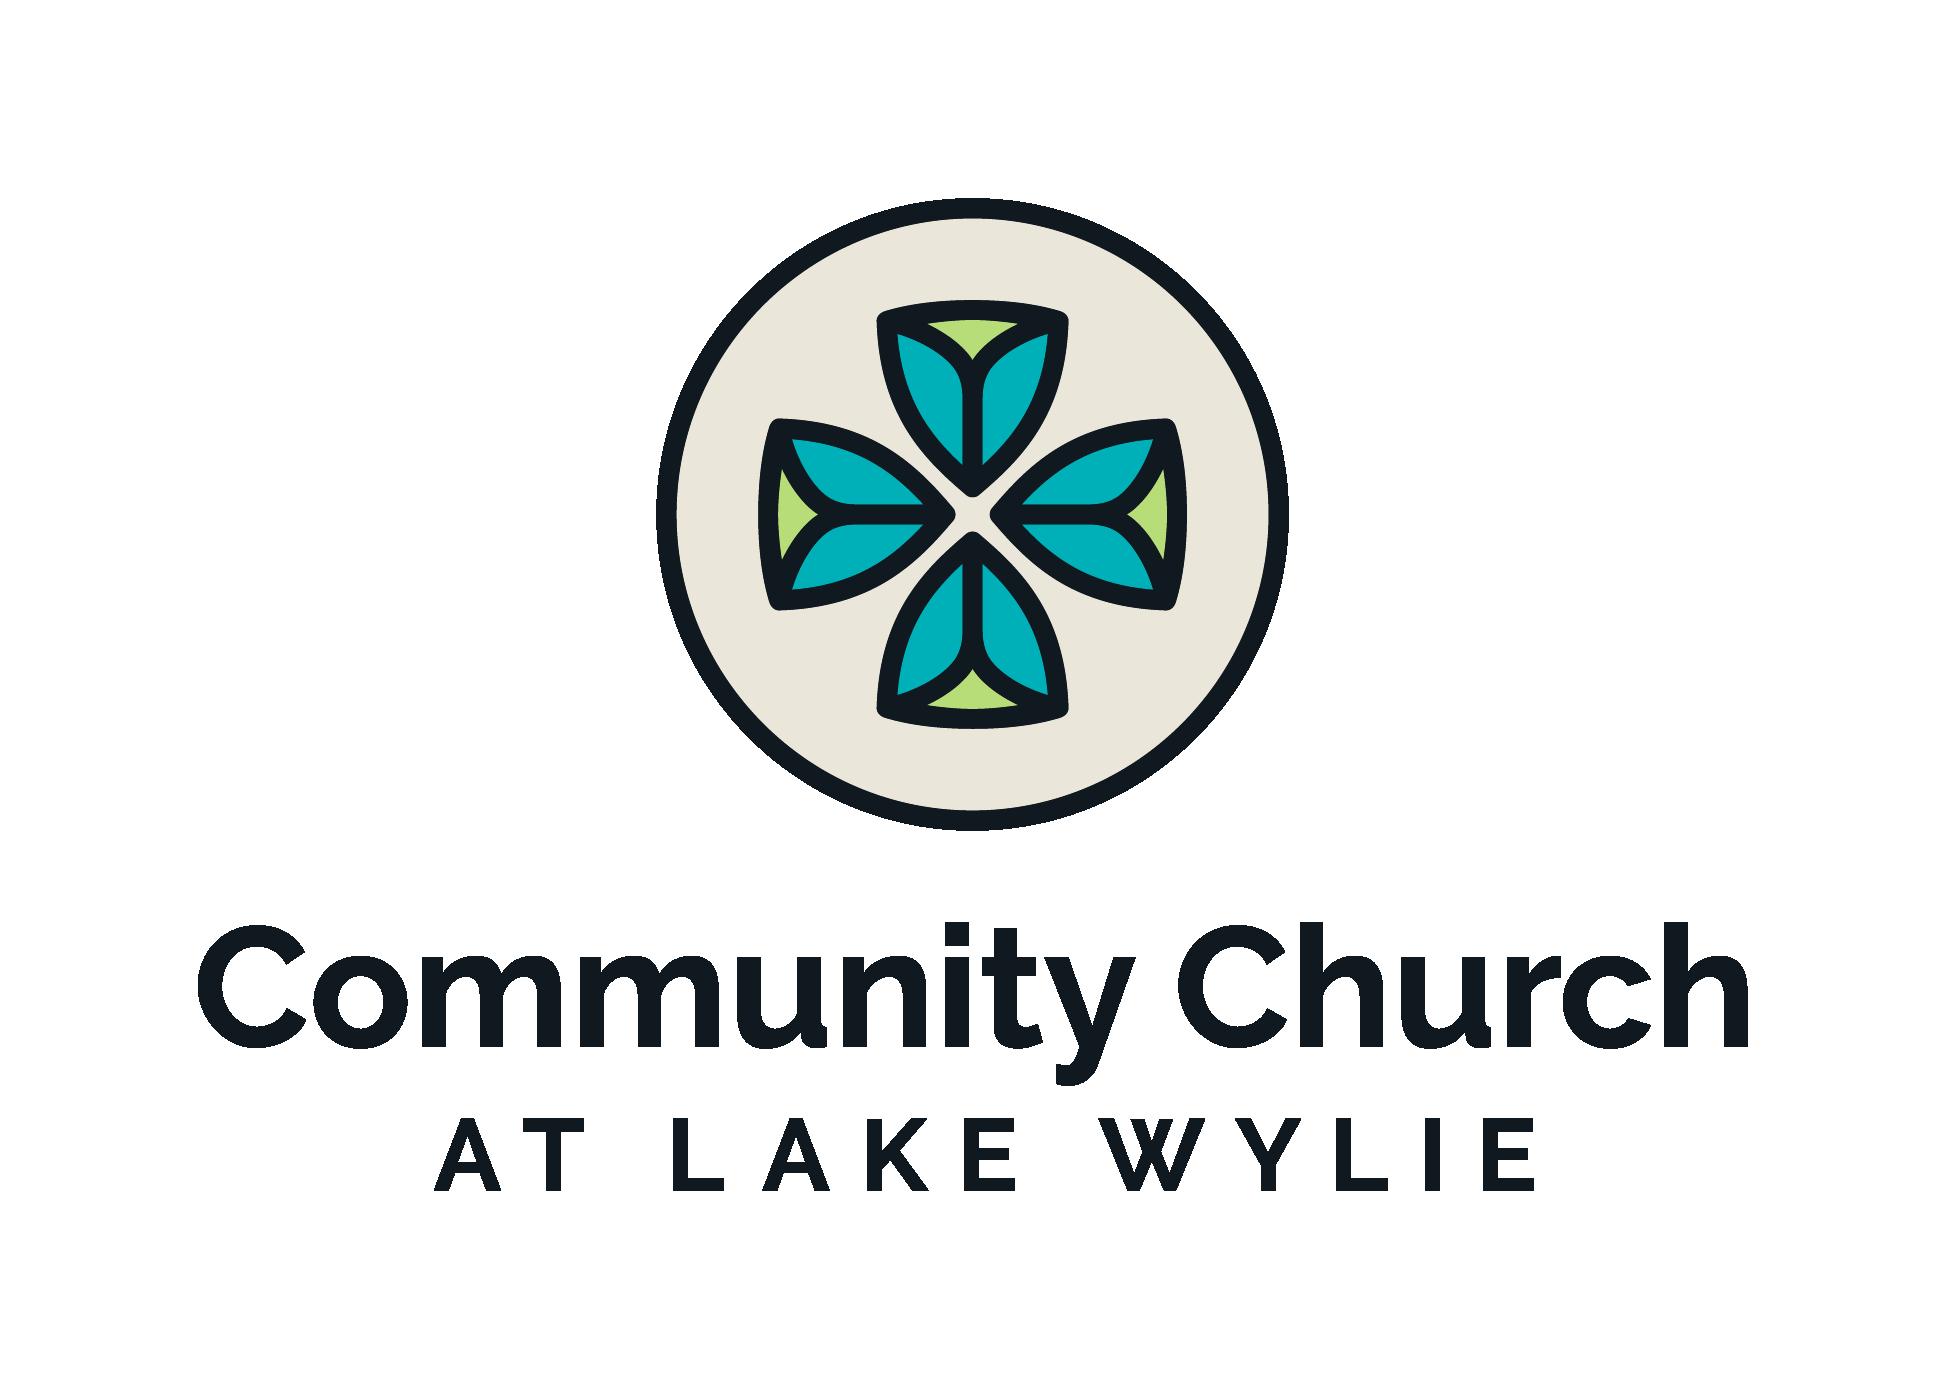 Community Church at Lake Wylie